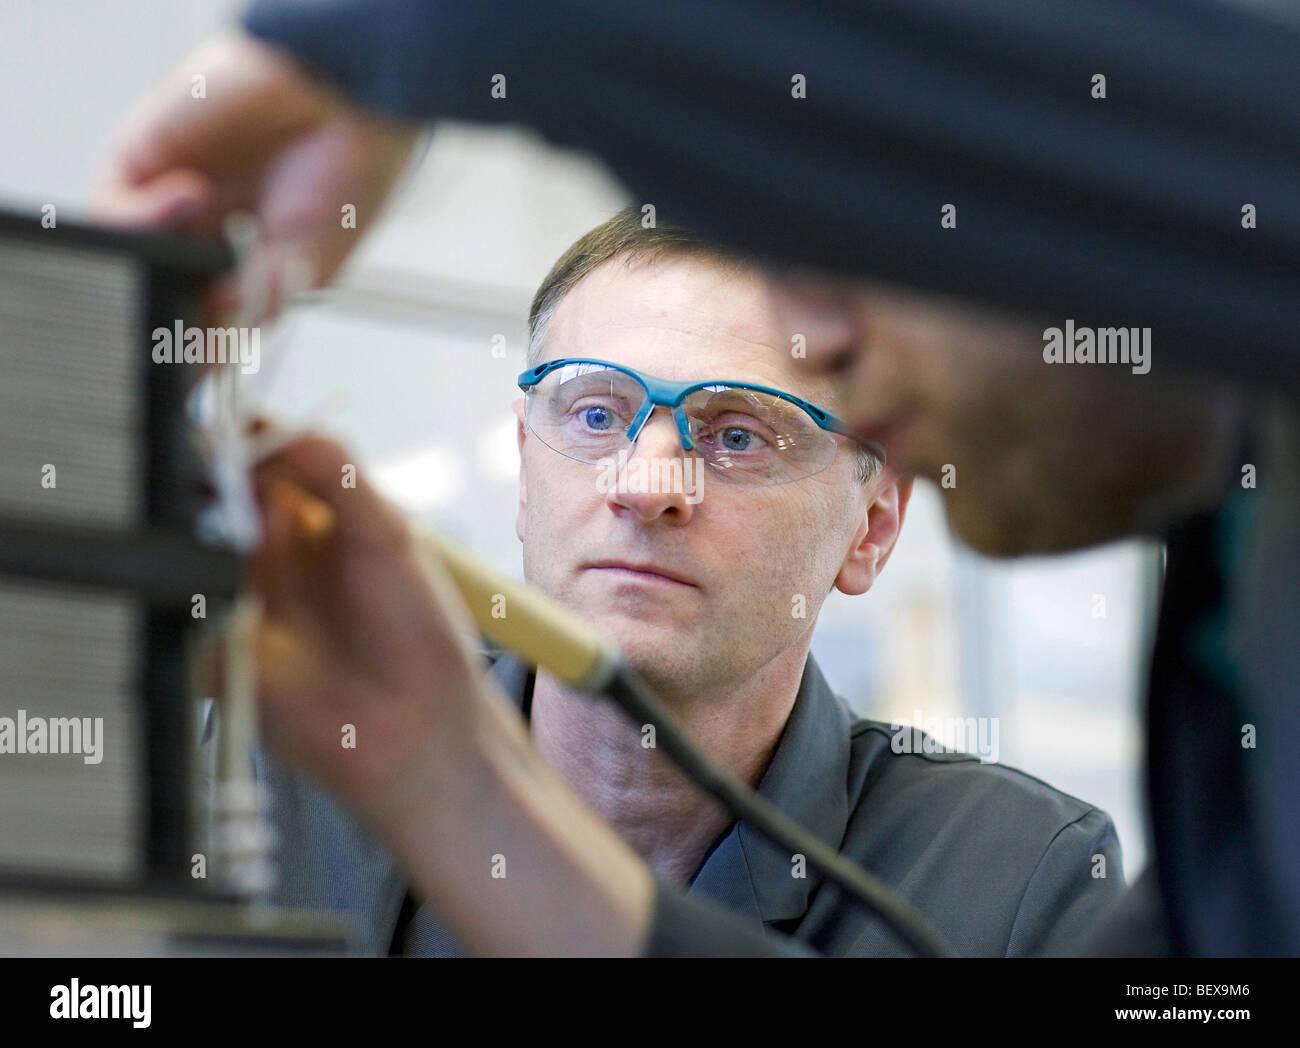 Staxera GmbH, Produktion von Stickoxid-Brennstoffzellen-stacks Stockbild